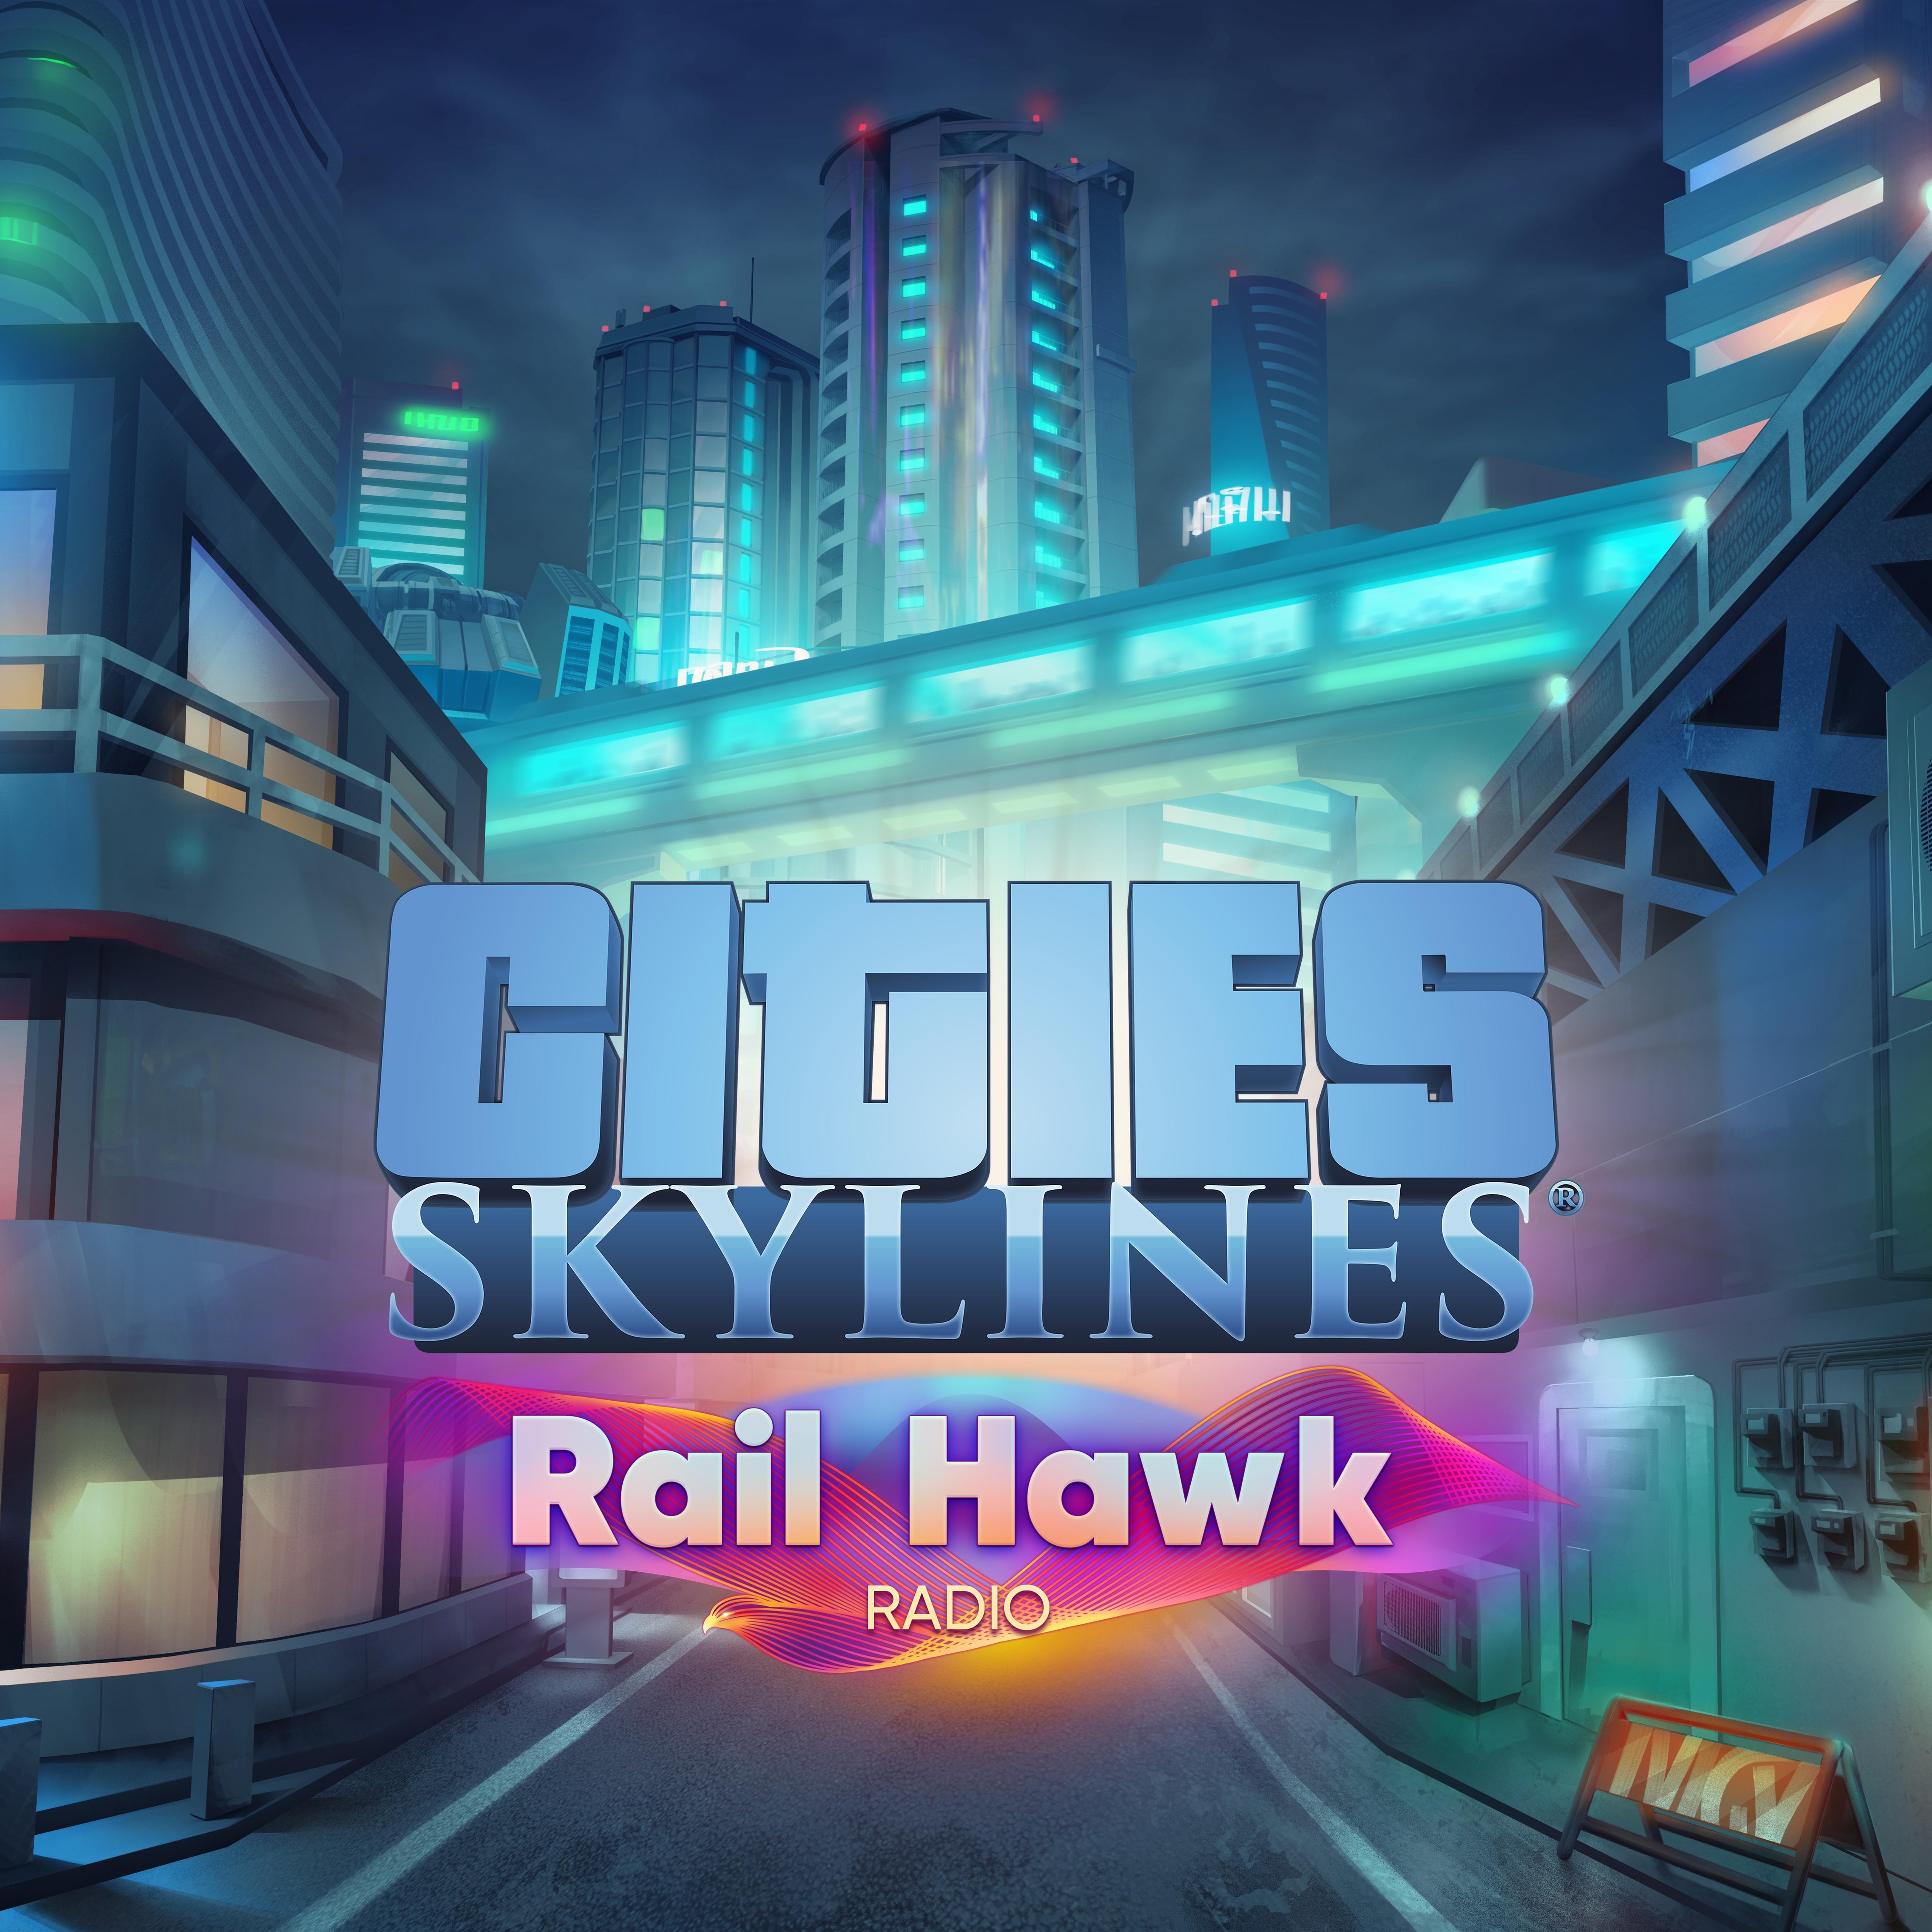 Cities: Skylines - Rail Hawk Radio   ROW (78352a2c-fb72-40ec-8685-0be19b5445a3)